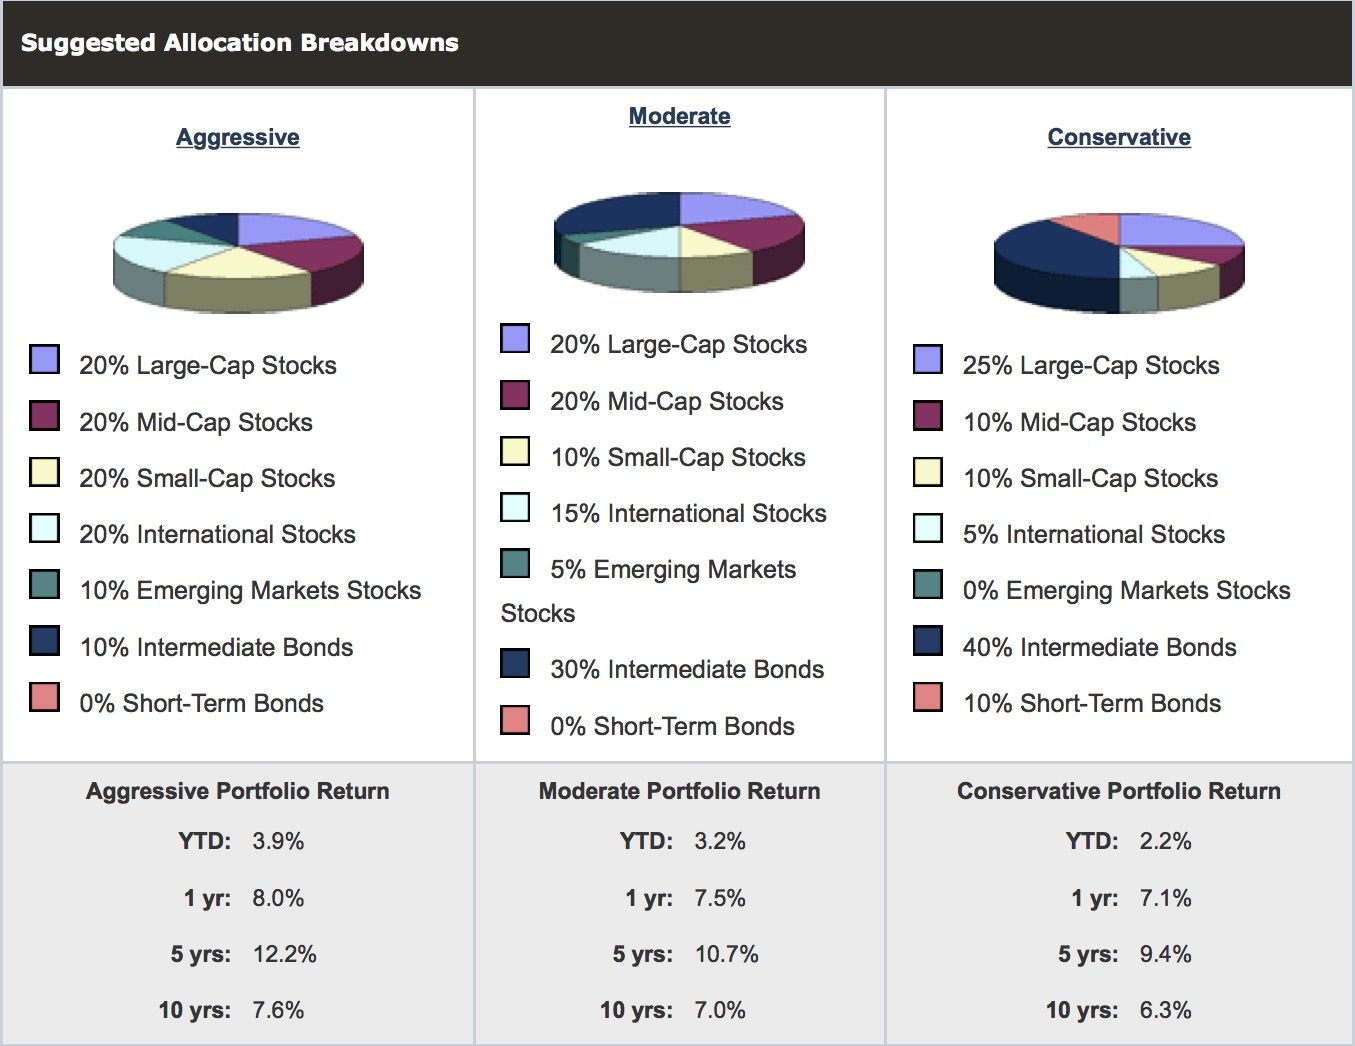 AAII Asset Allocation Models | AAII: The American Association of Individual Investors